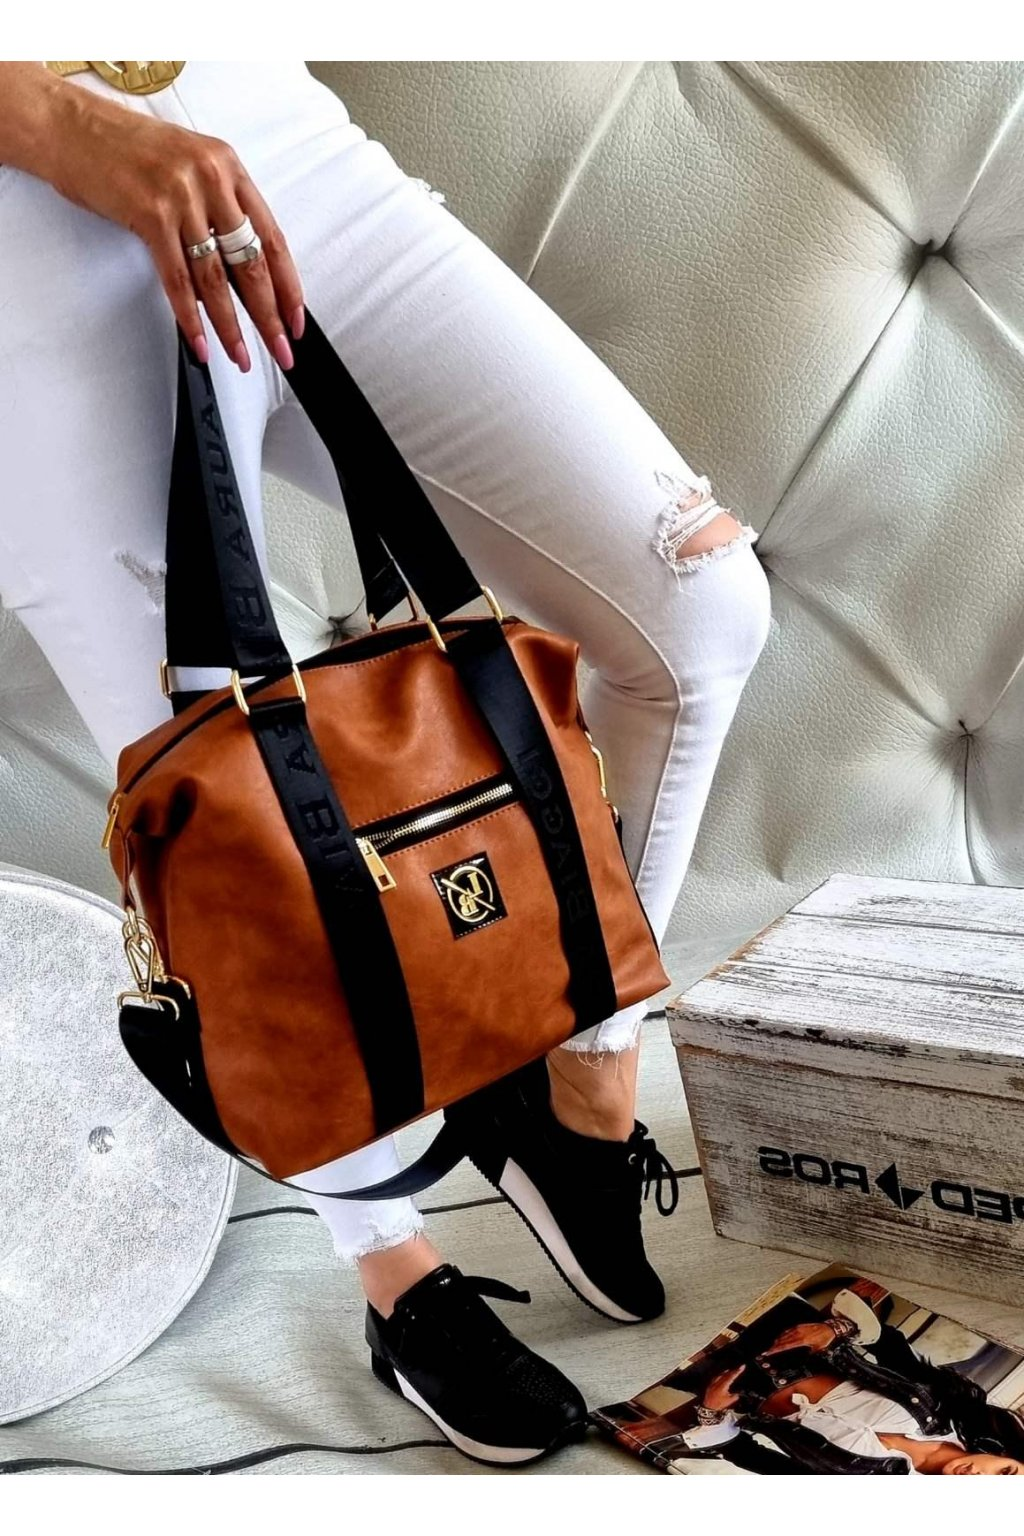 kabelka Laura Biaggi koňak fashion trendy luxusní kabelka